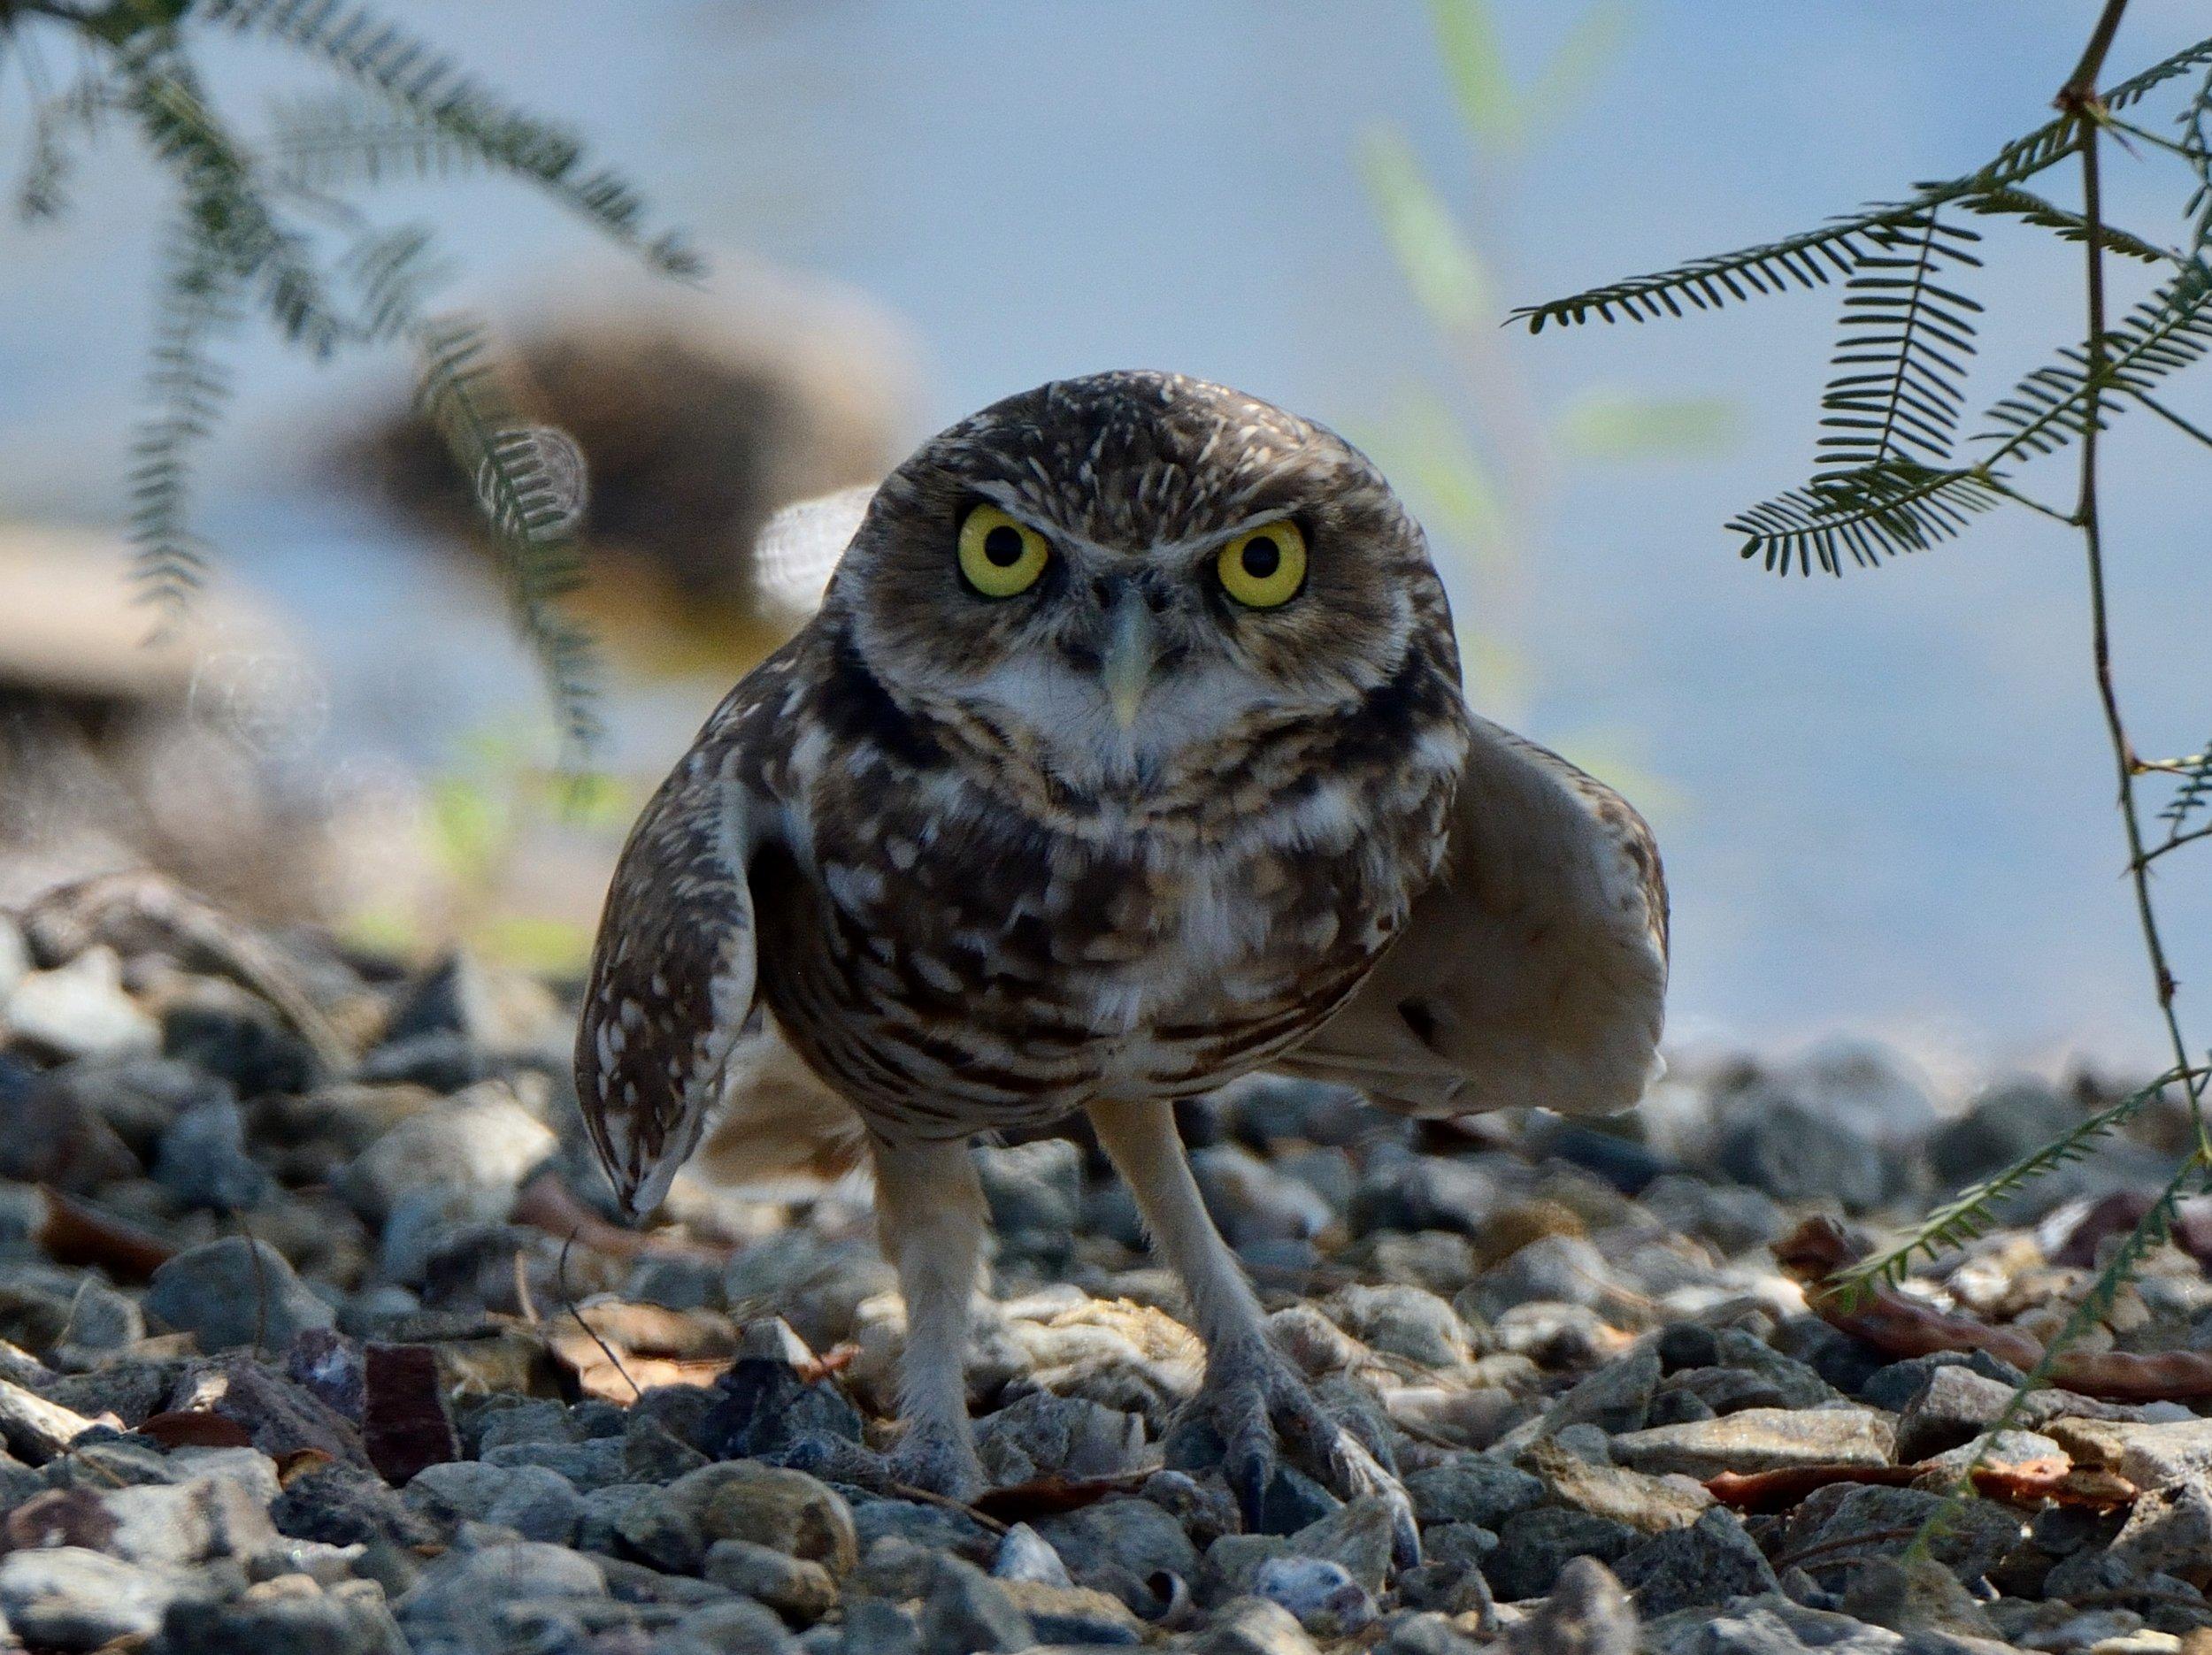 Dine around - blue owl - Tuesday, June 19, 2010